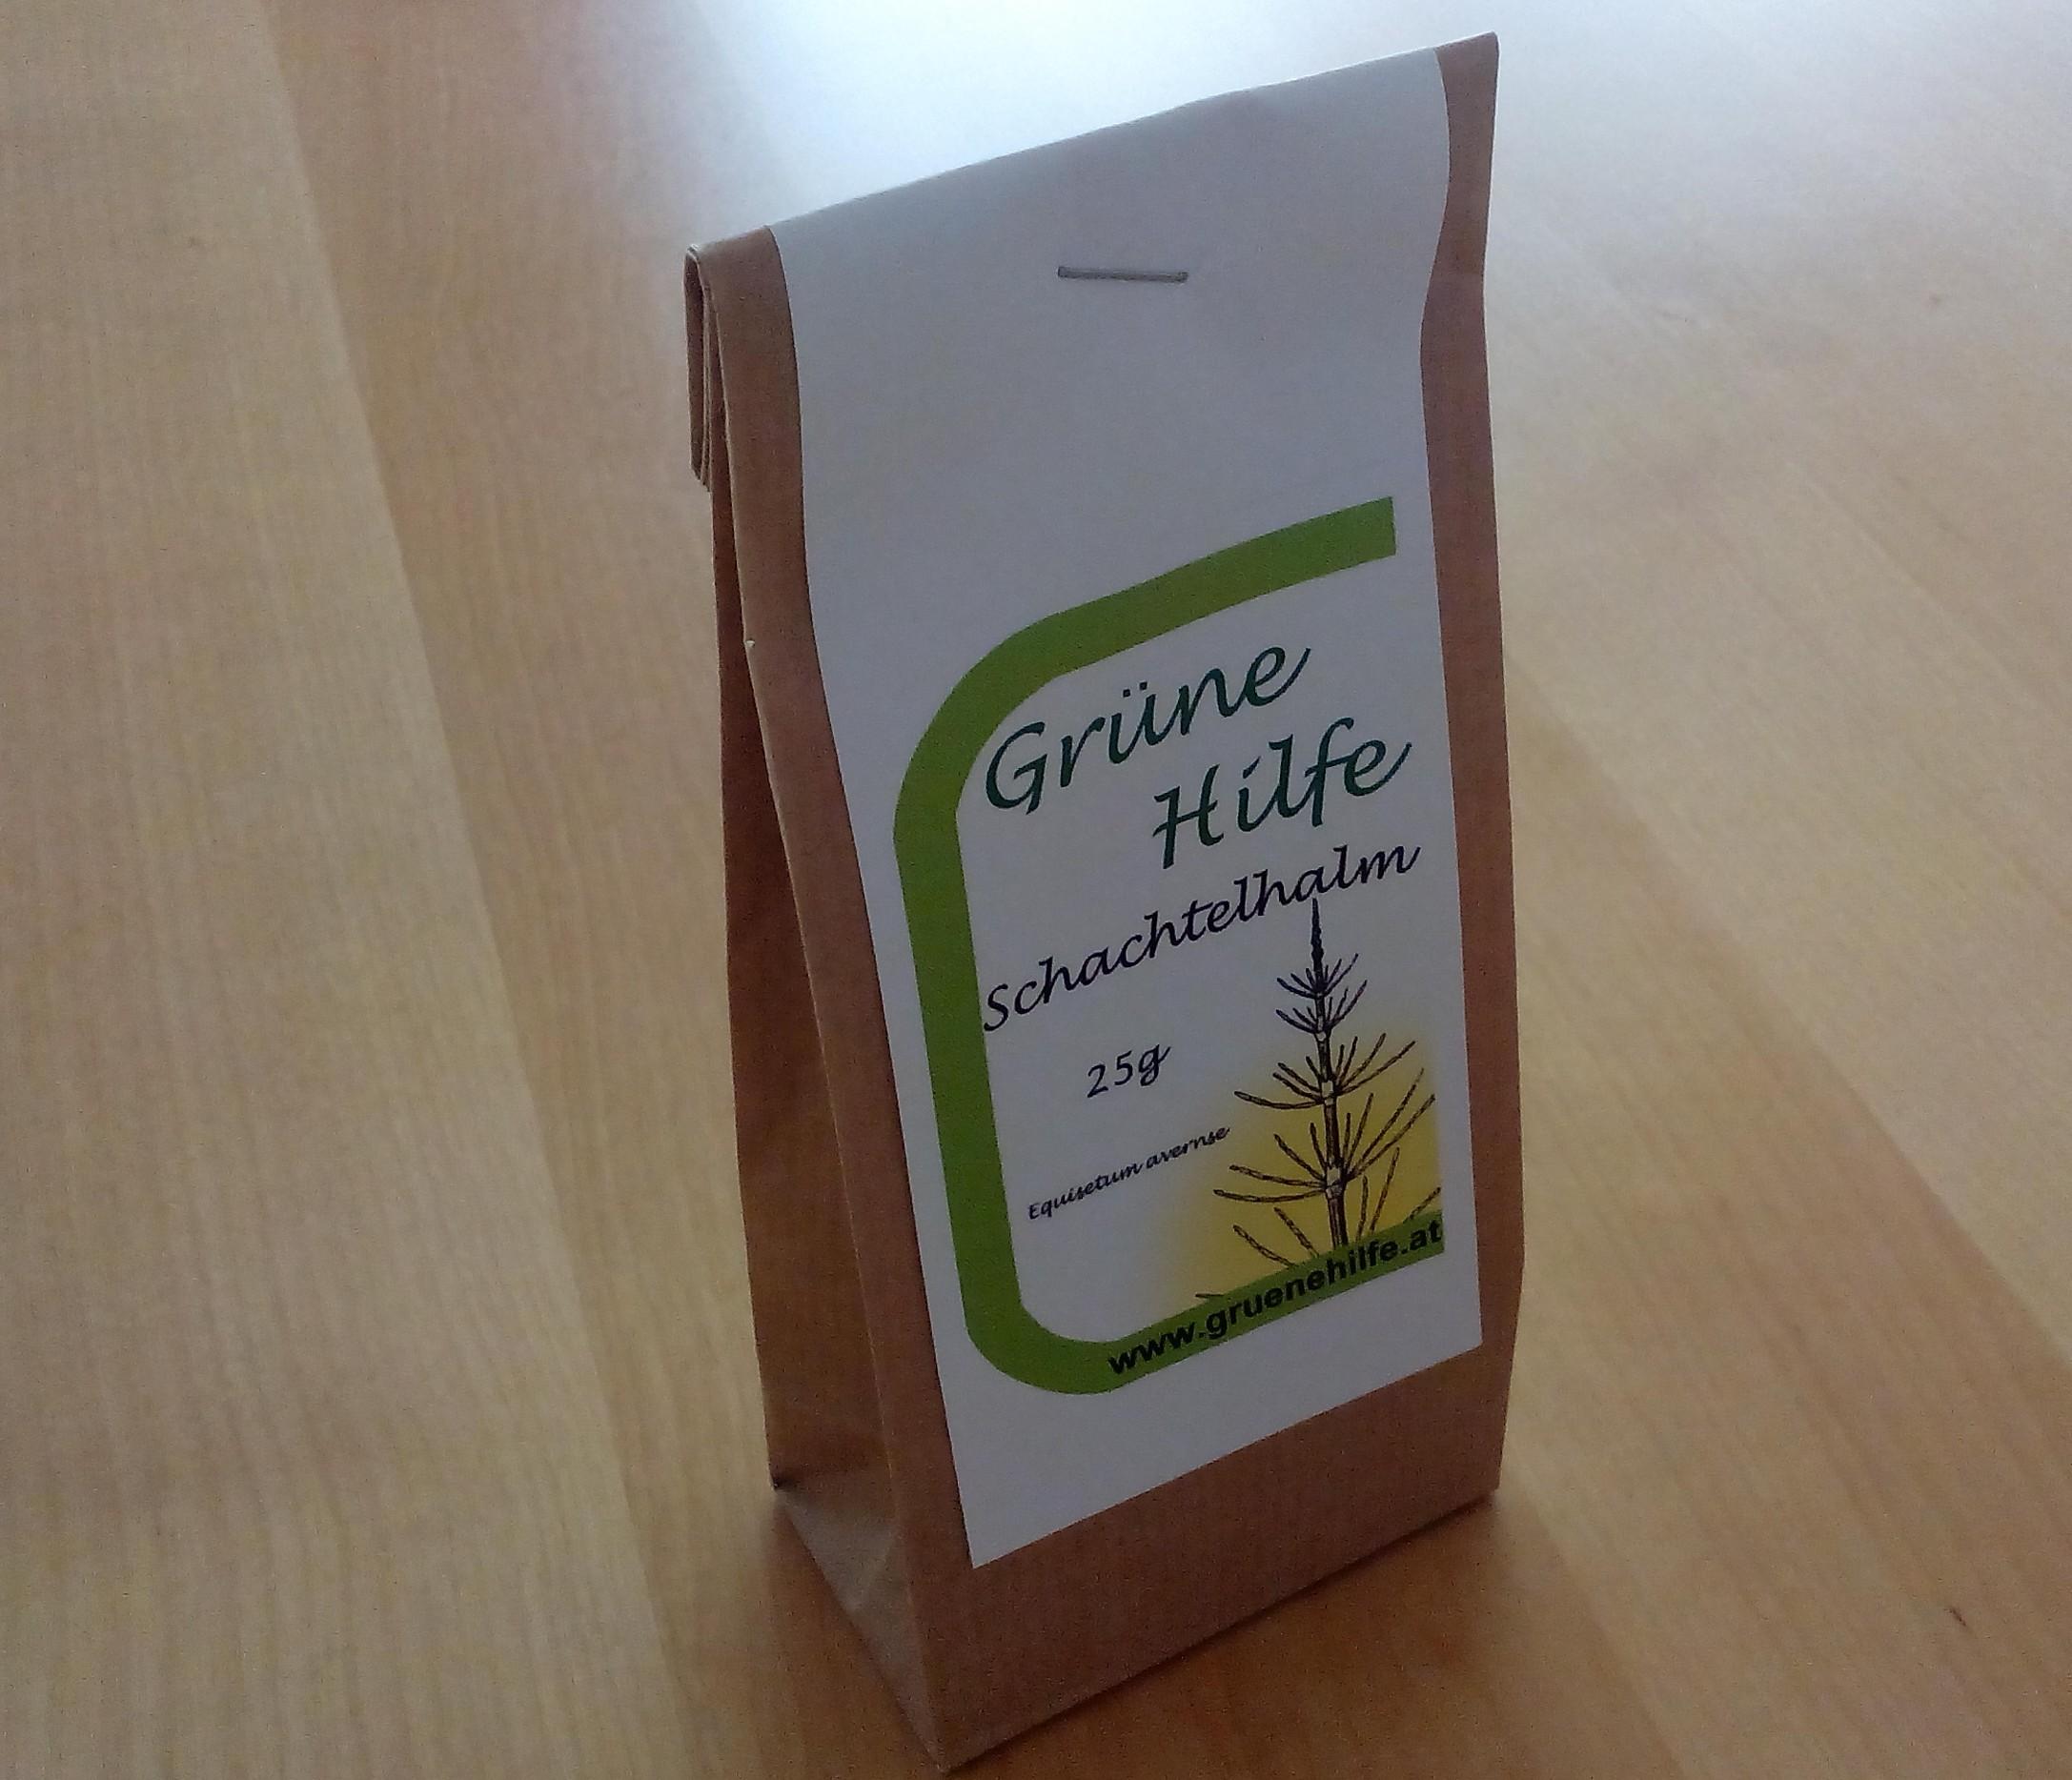 GrüneHilfe Schachtelhalm Single